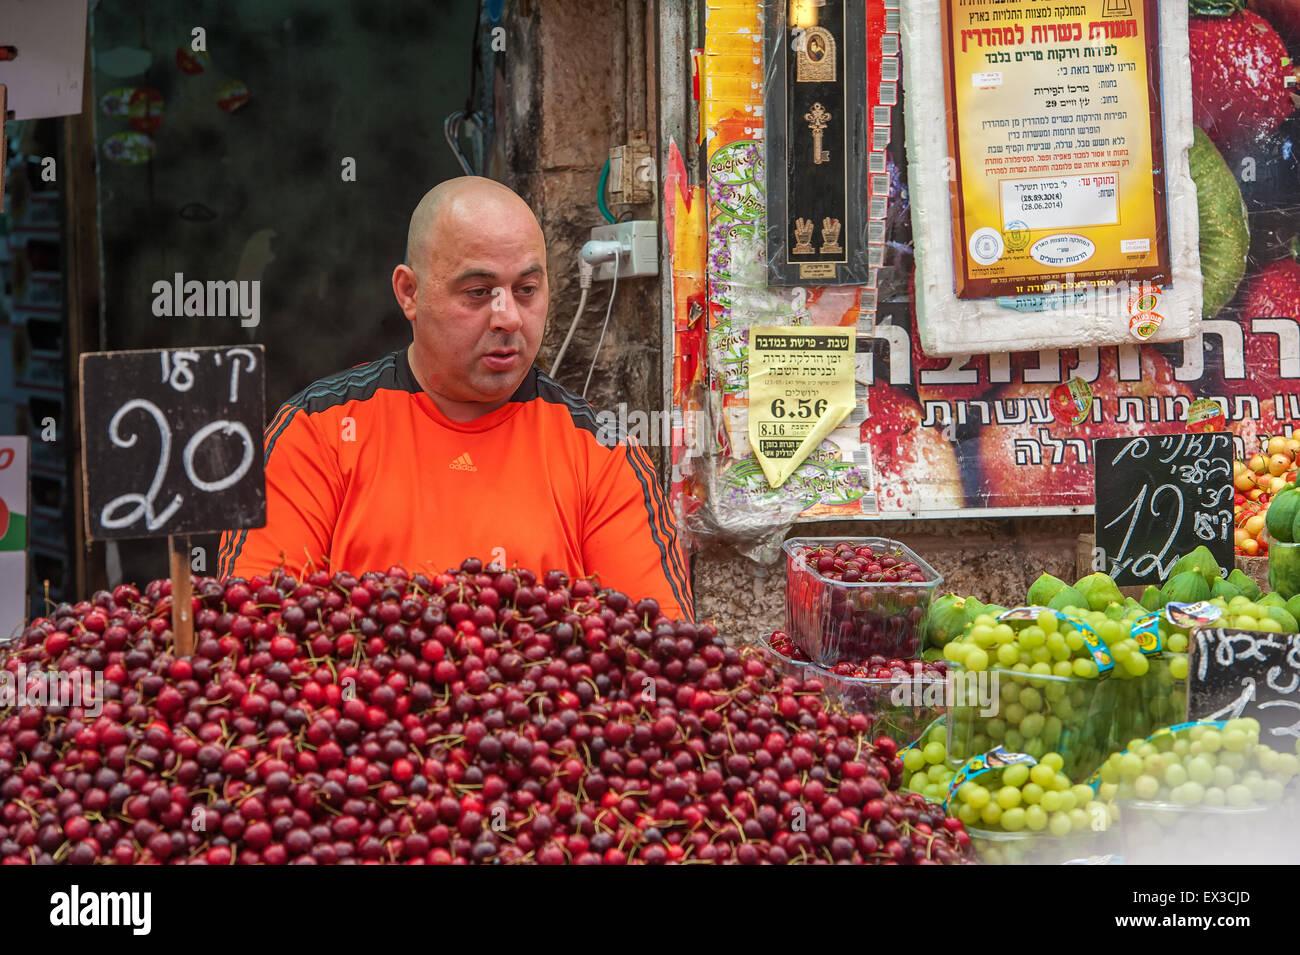 Fruit vendor, Machane Yehuda Market, Jerusalem, Israel - Stock Image